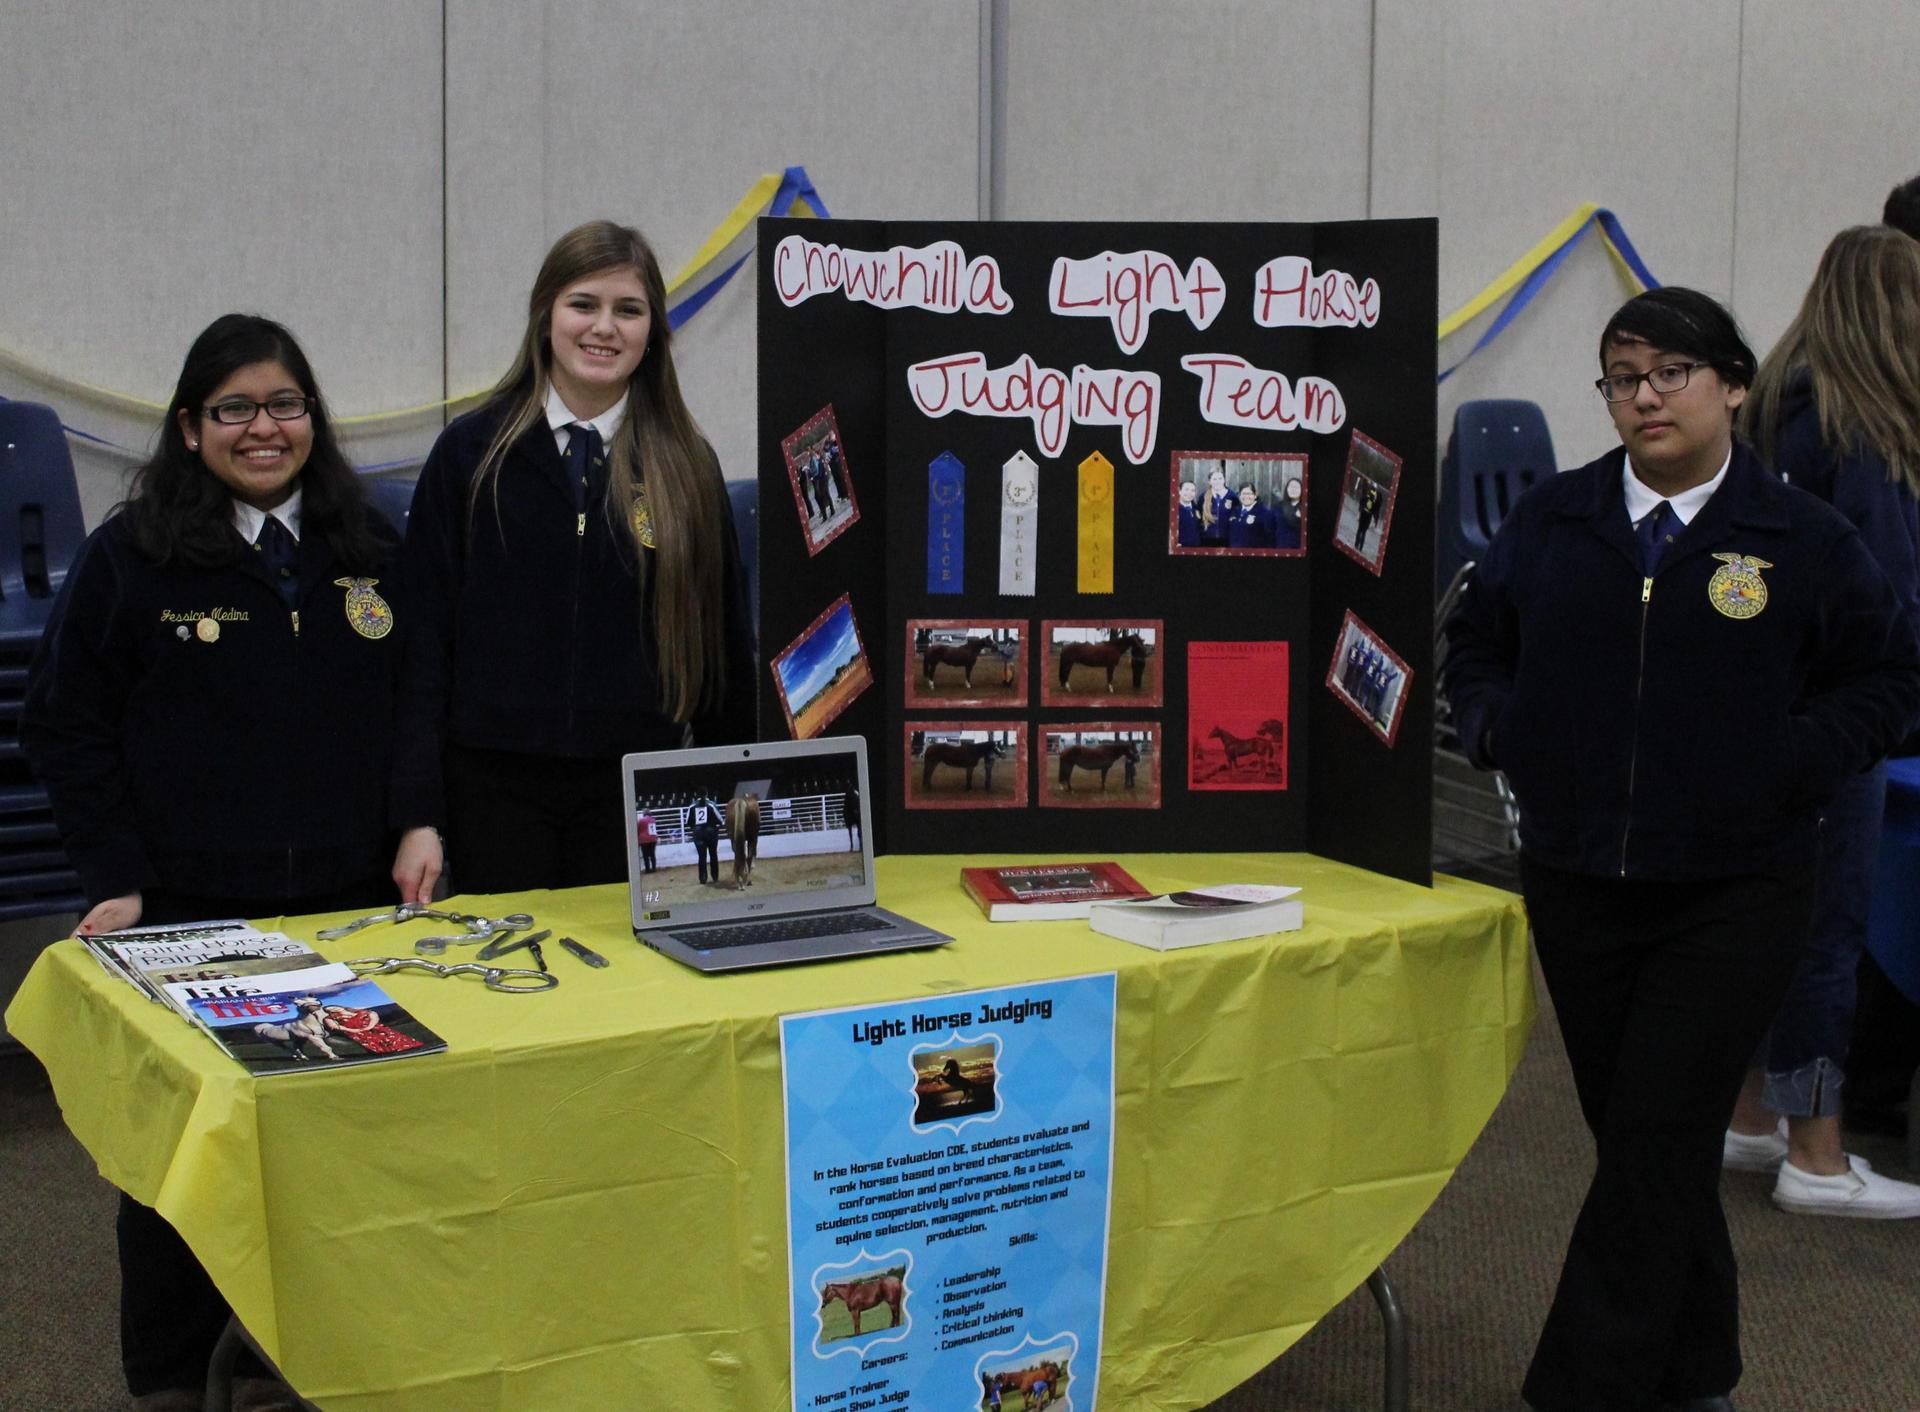 Jessica Medina, Victoria Jimenez, and Athena Camacho at Light Horse Judging